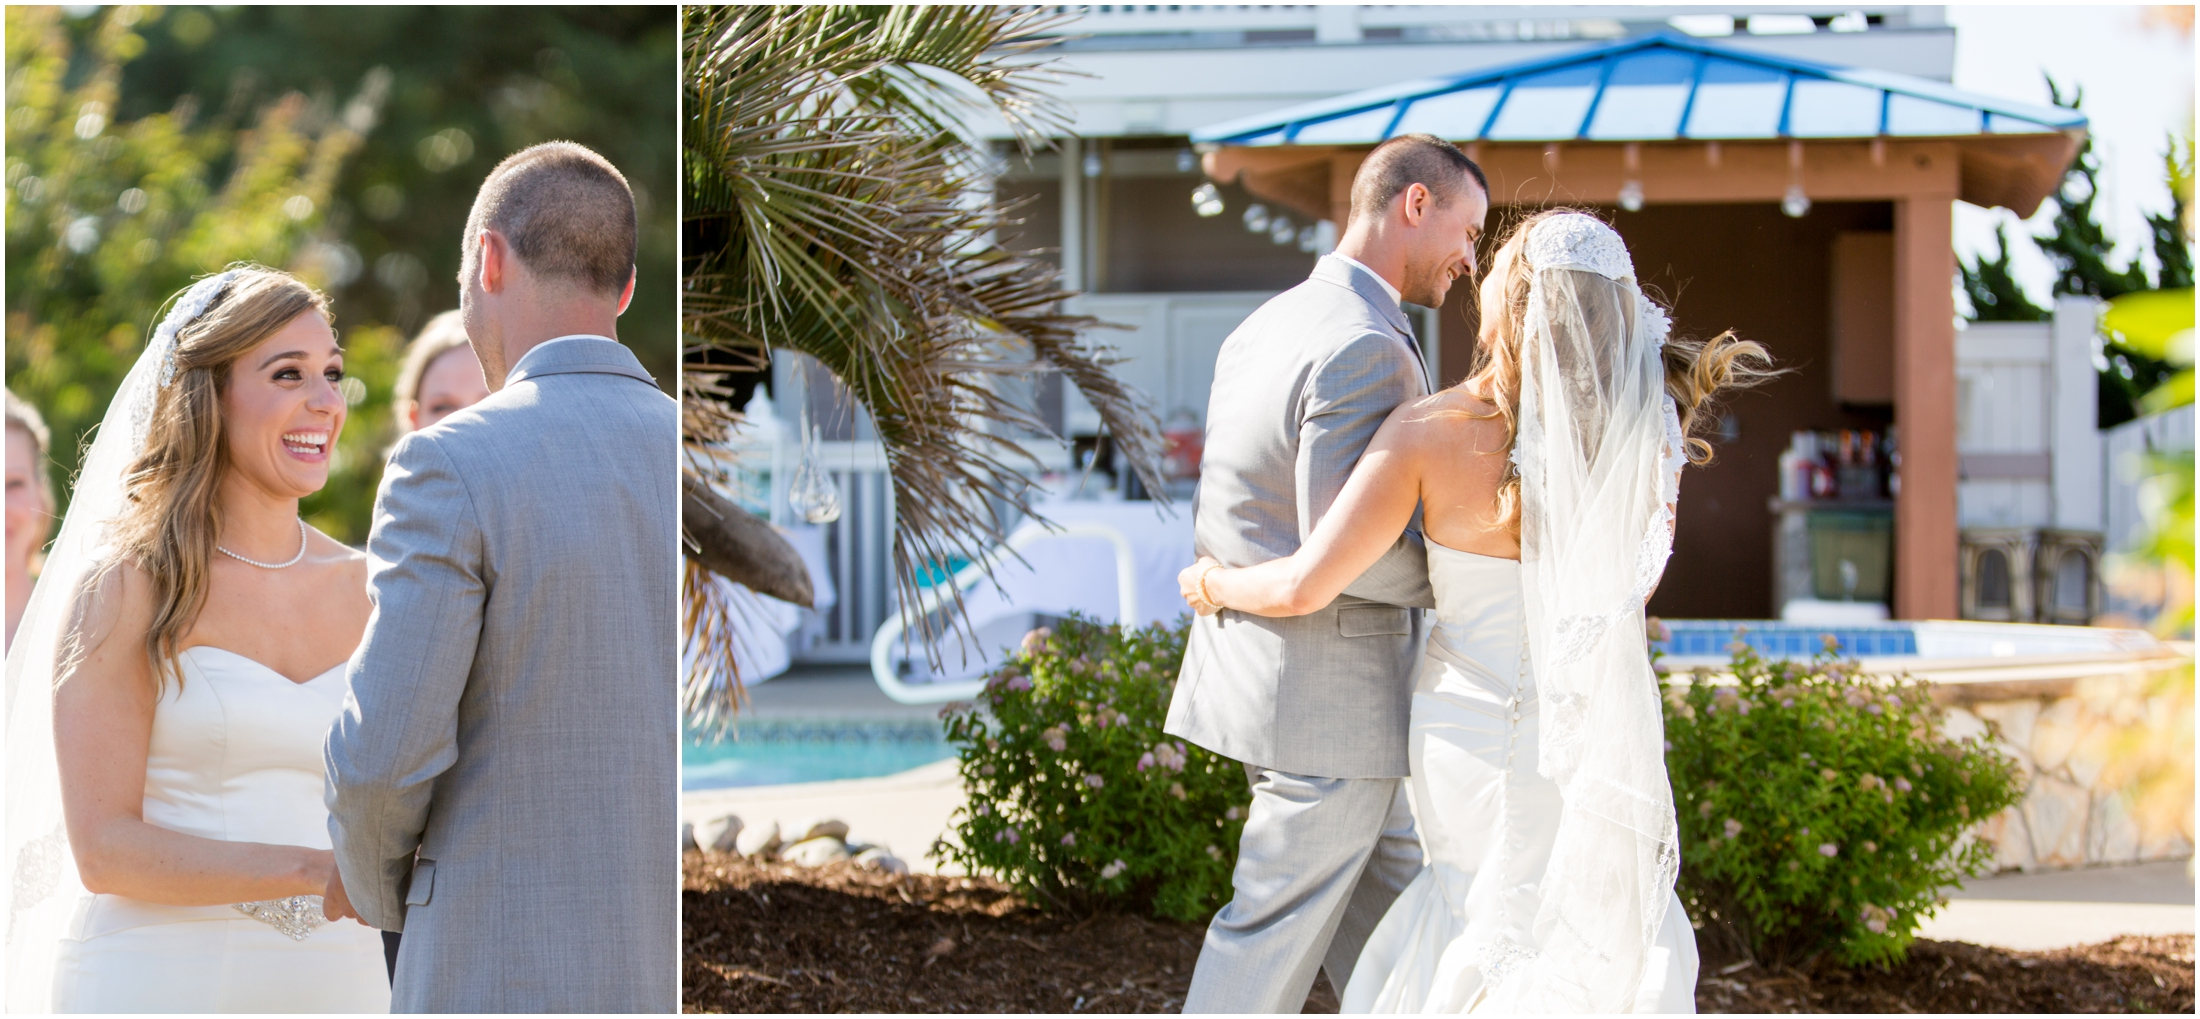 Pearce-Wedding-Ceremony-507.jpg